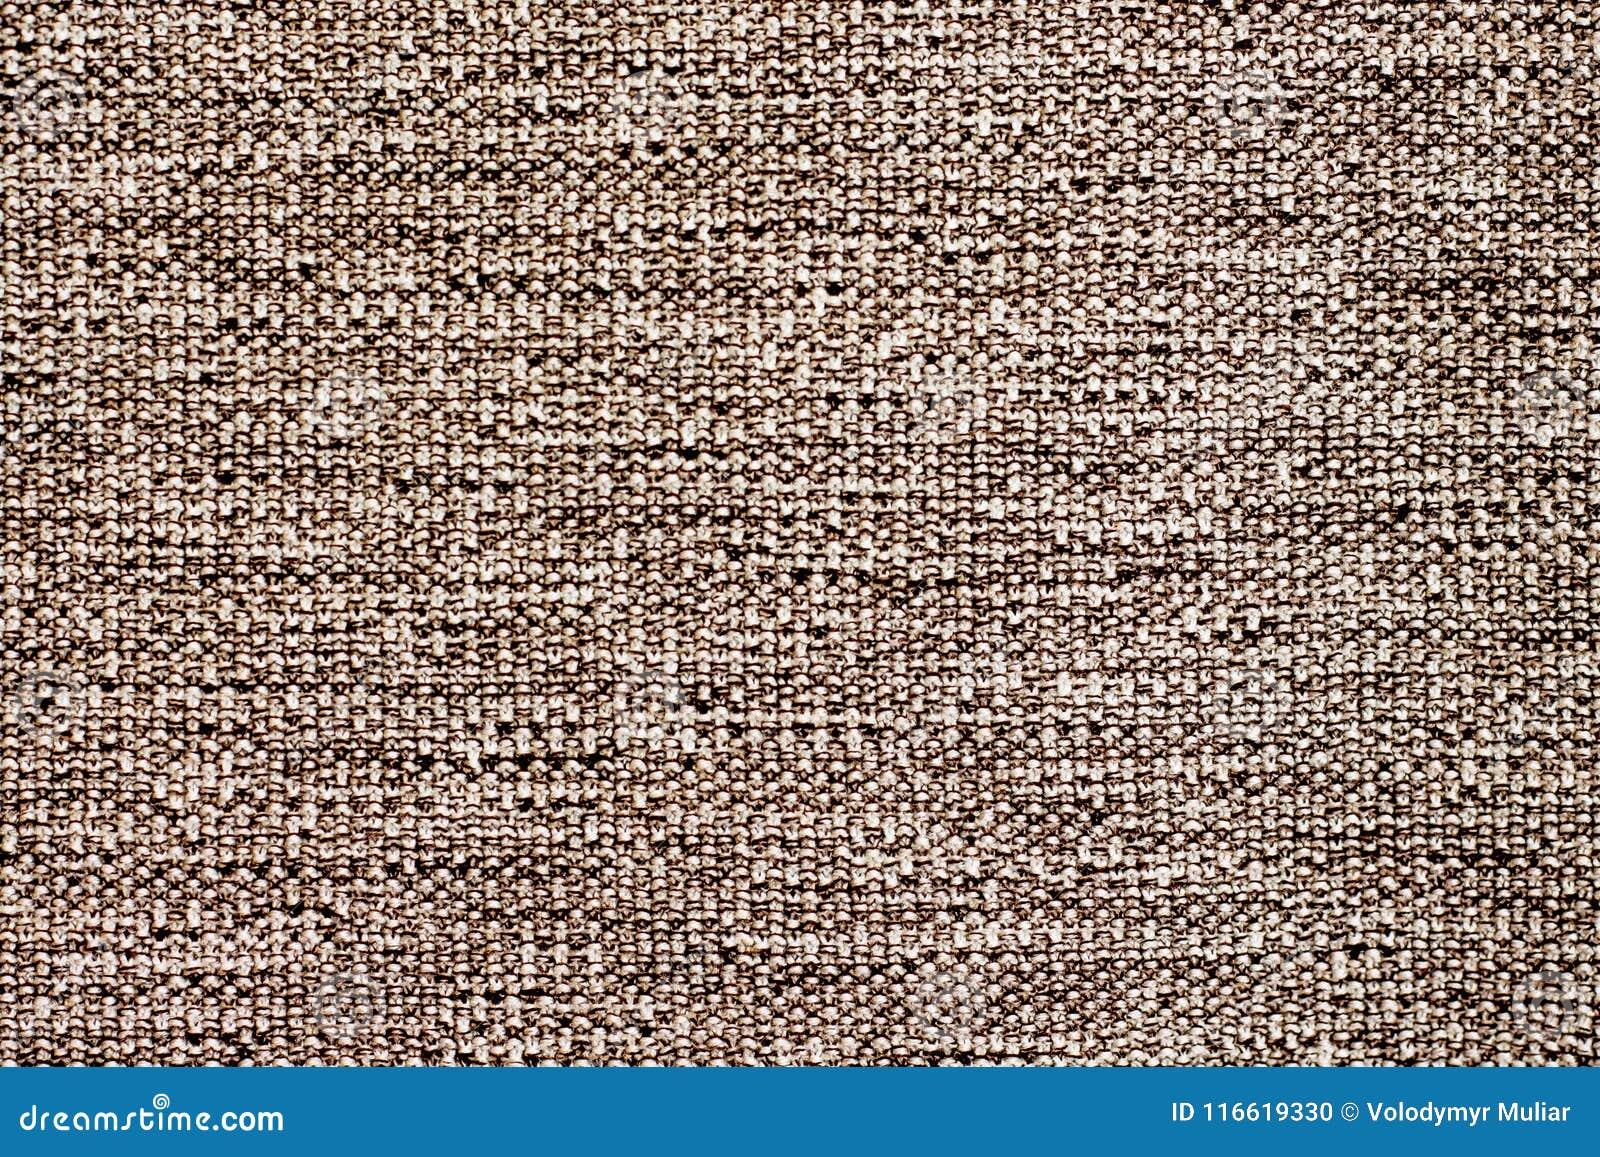 Textura De La Tela Natural Gruesa Del Color Marron Para El Design - El-color-marron